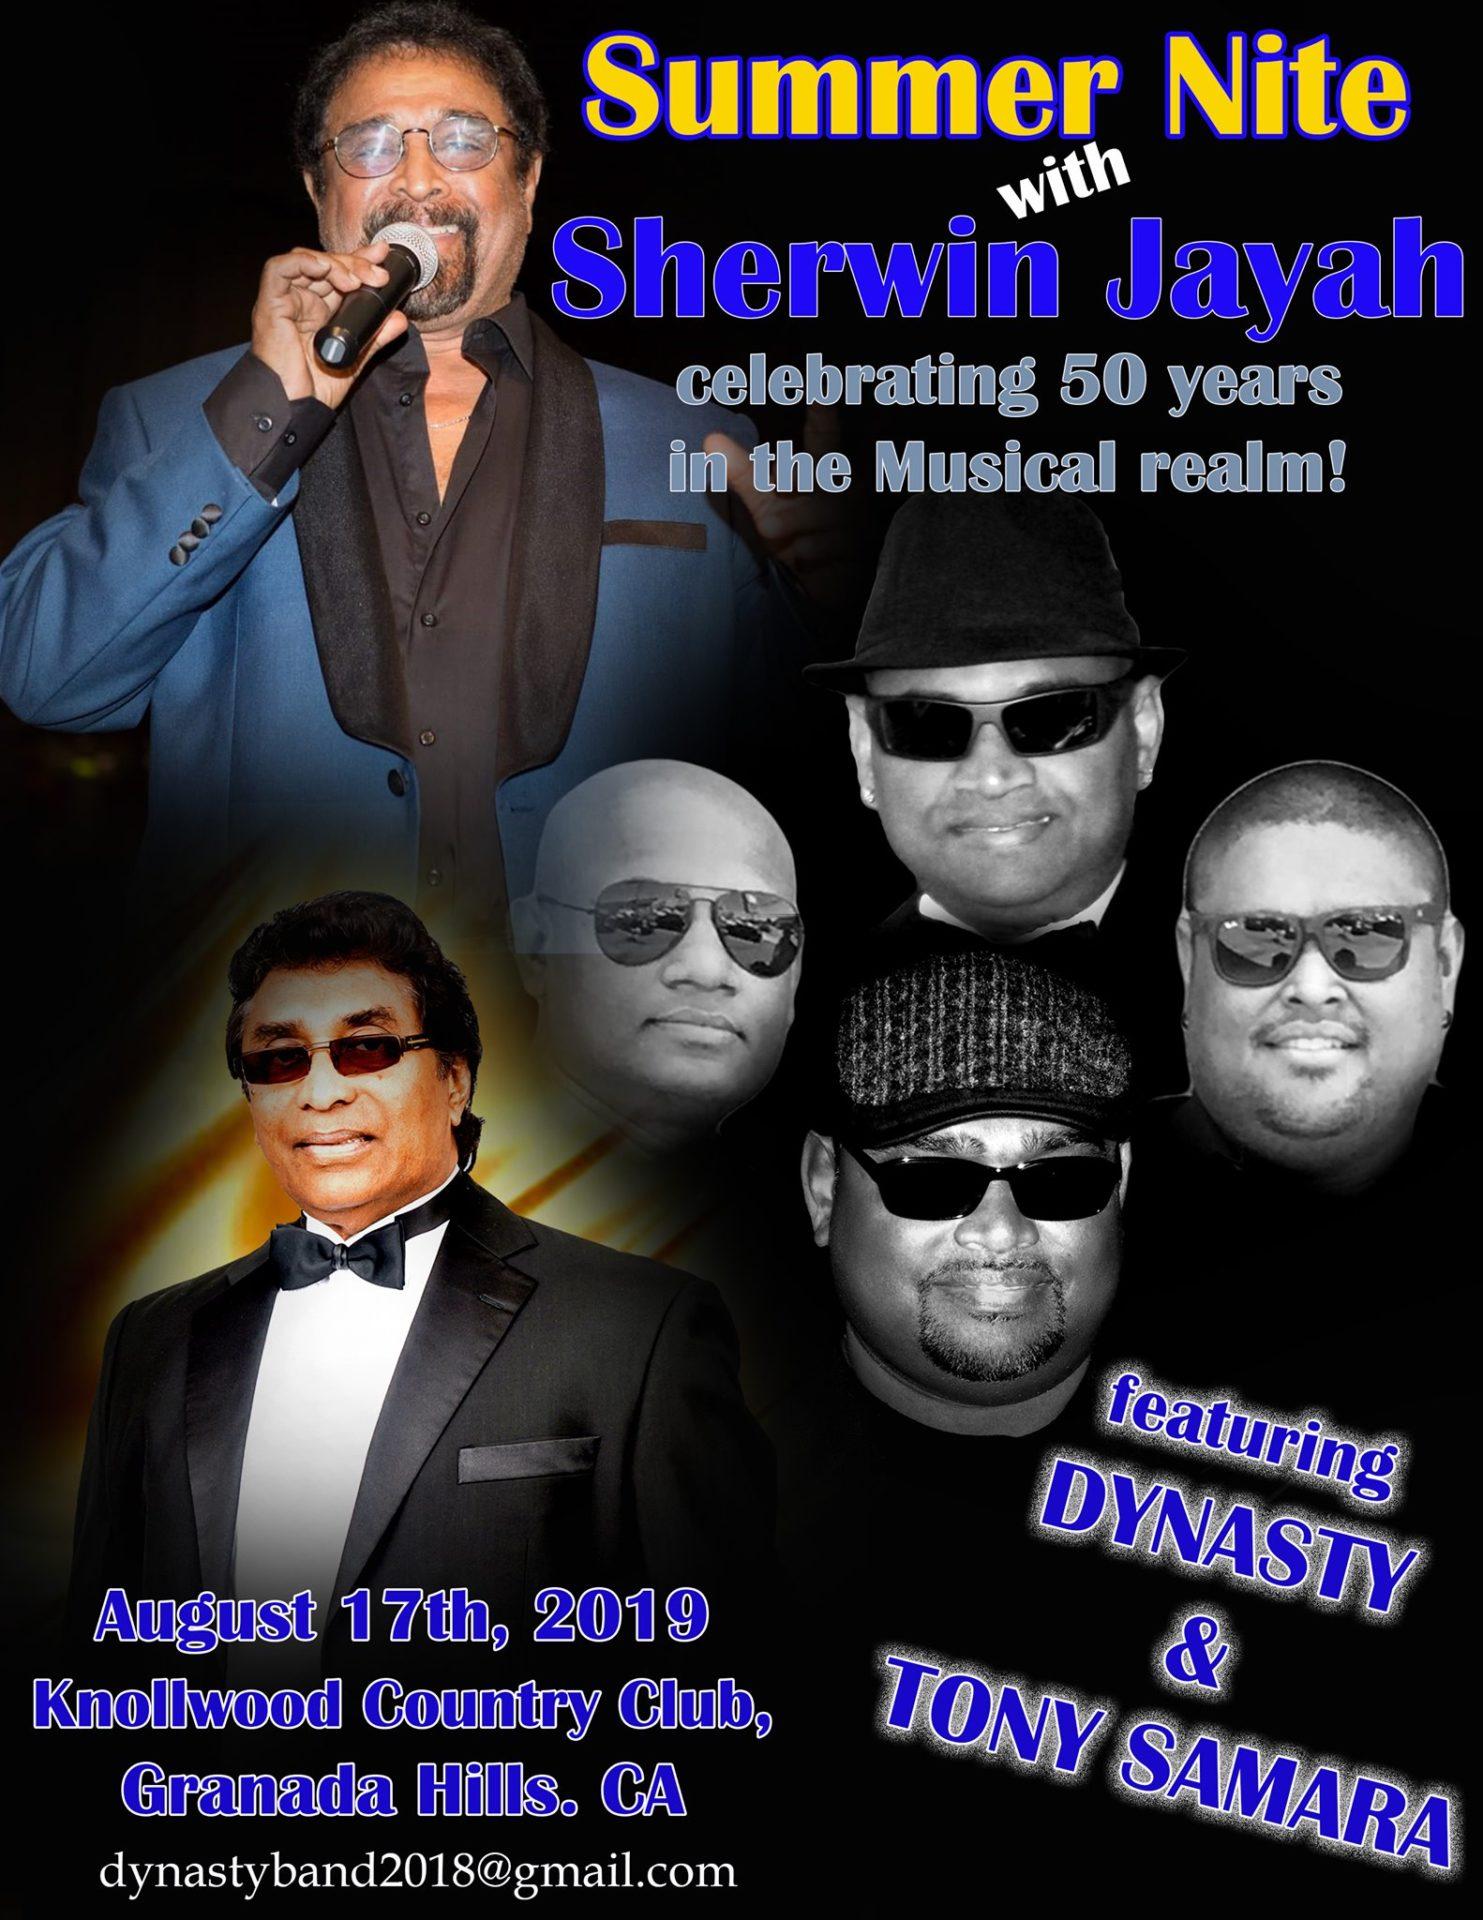 Summer Night With Sherwin Jayah